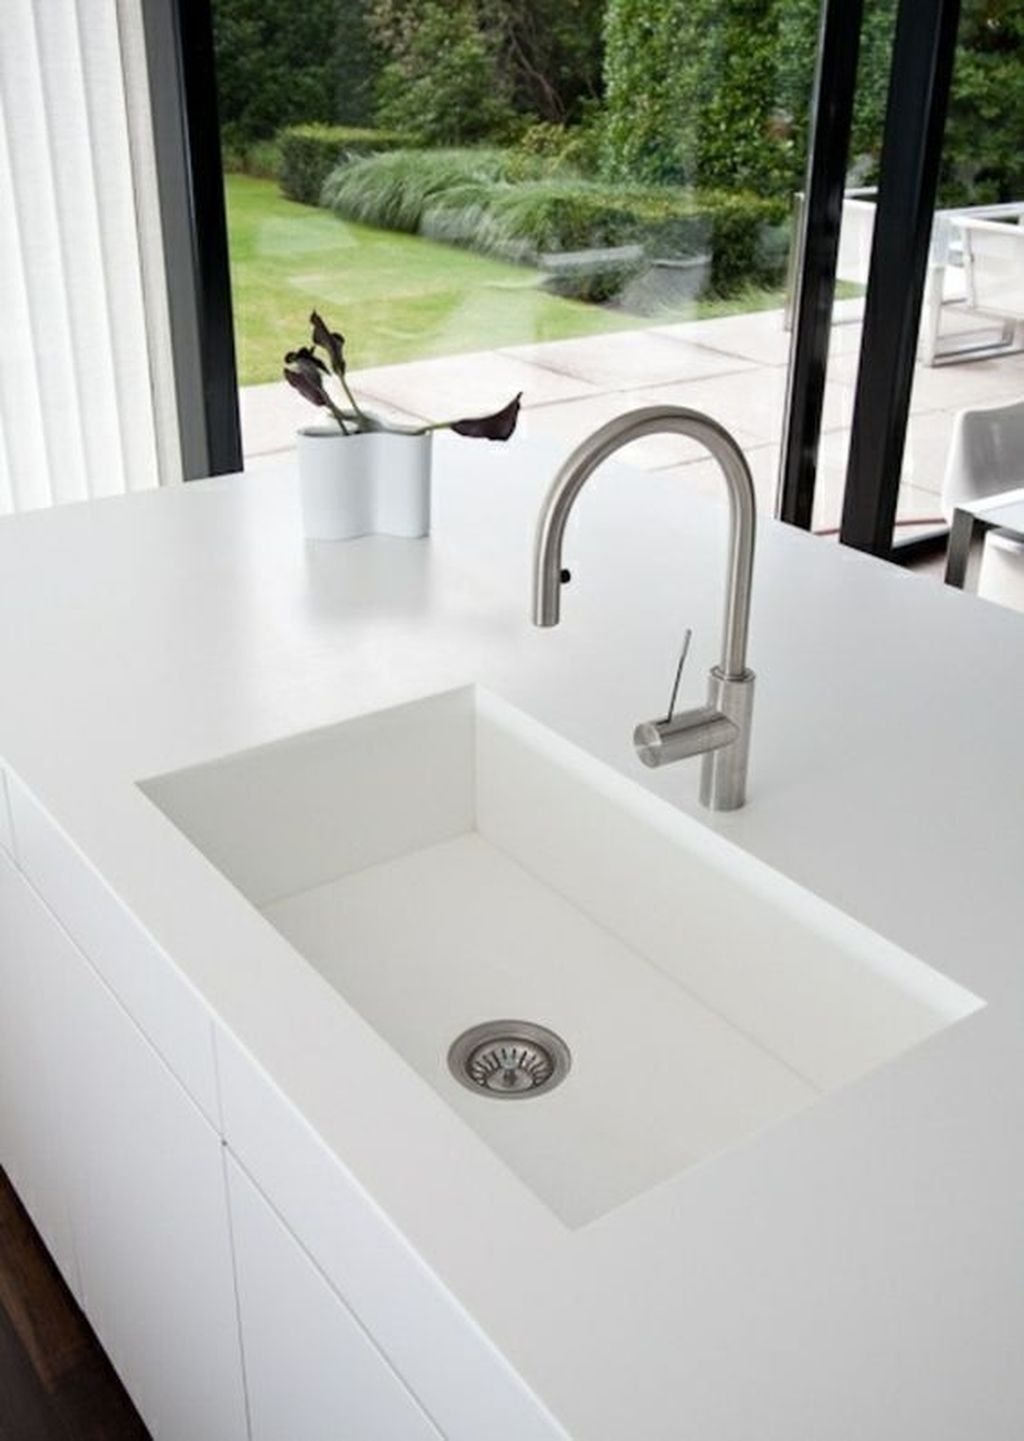 Enchanting Sink Design Ideas That Inspiring In This Year 11